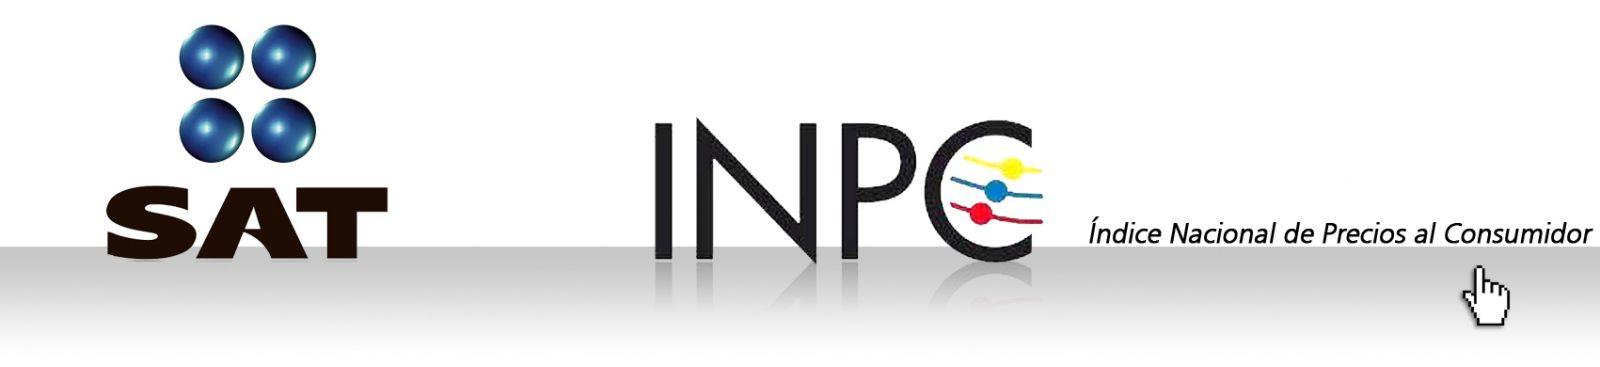 RA-CONTADORES :: INPC